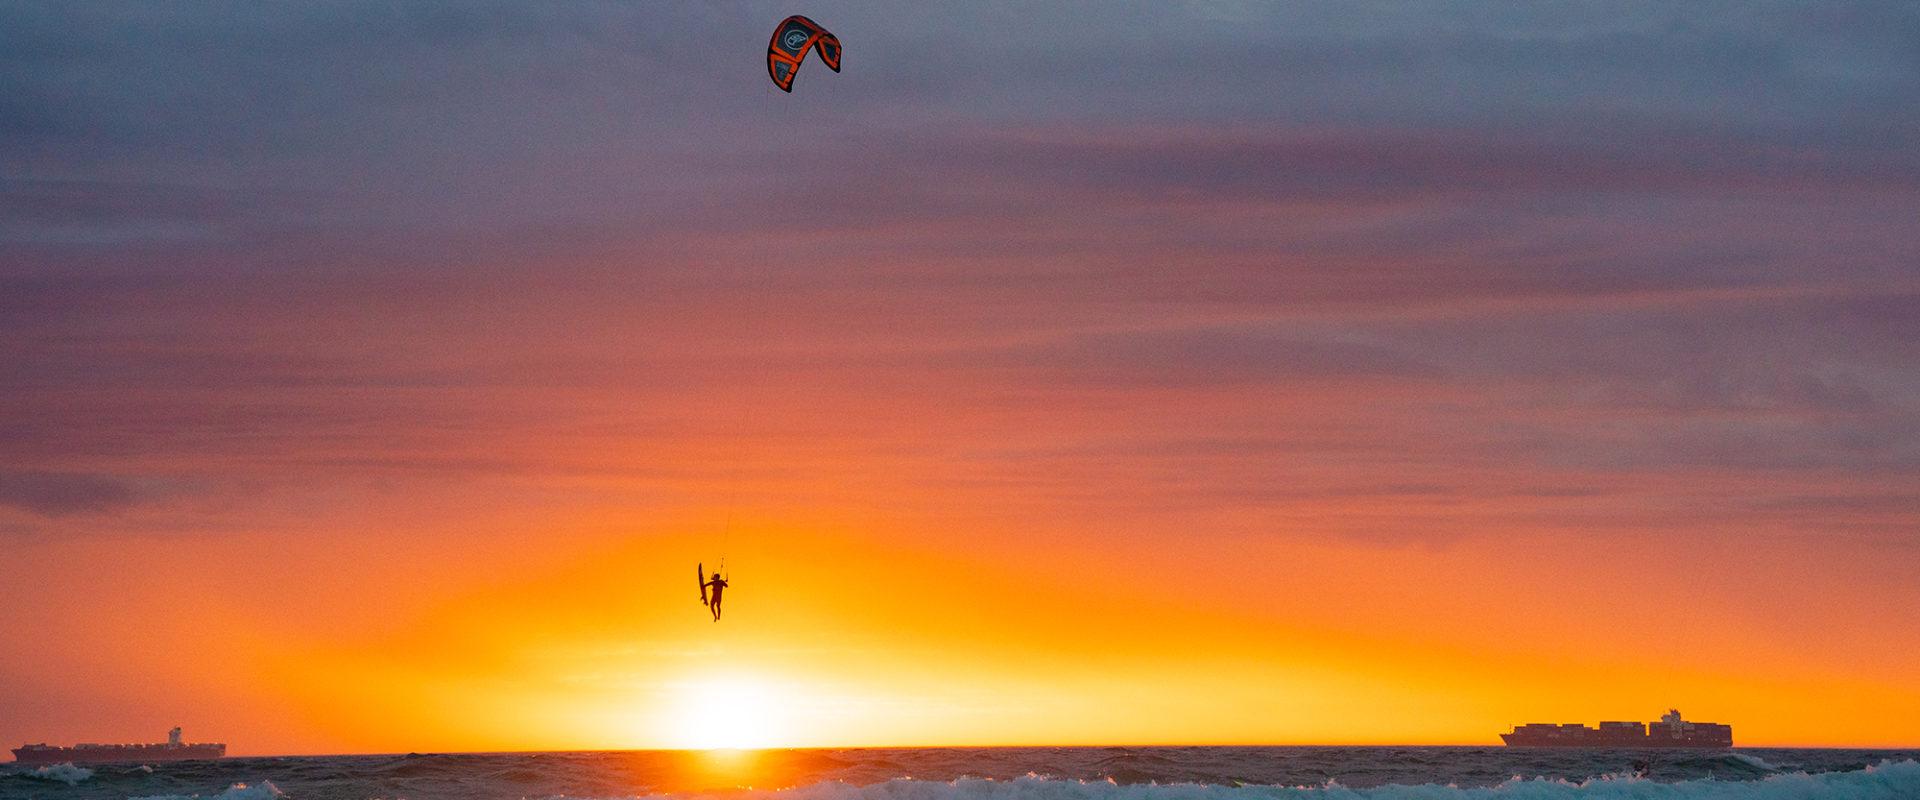 Flysurfer Stoke Sunset 21 01 2021 miriamjoanna selection 03701 copy 1920x800 - Home